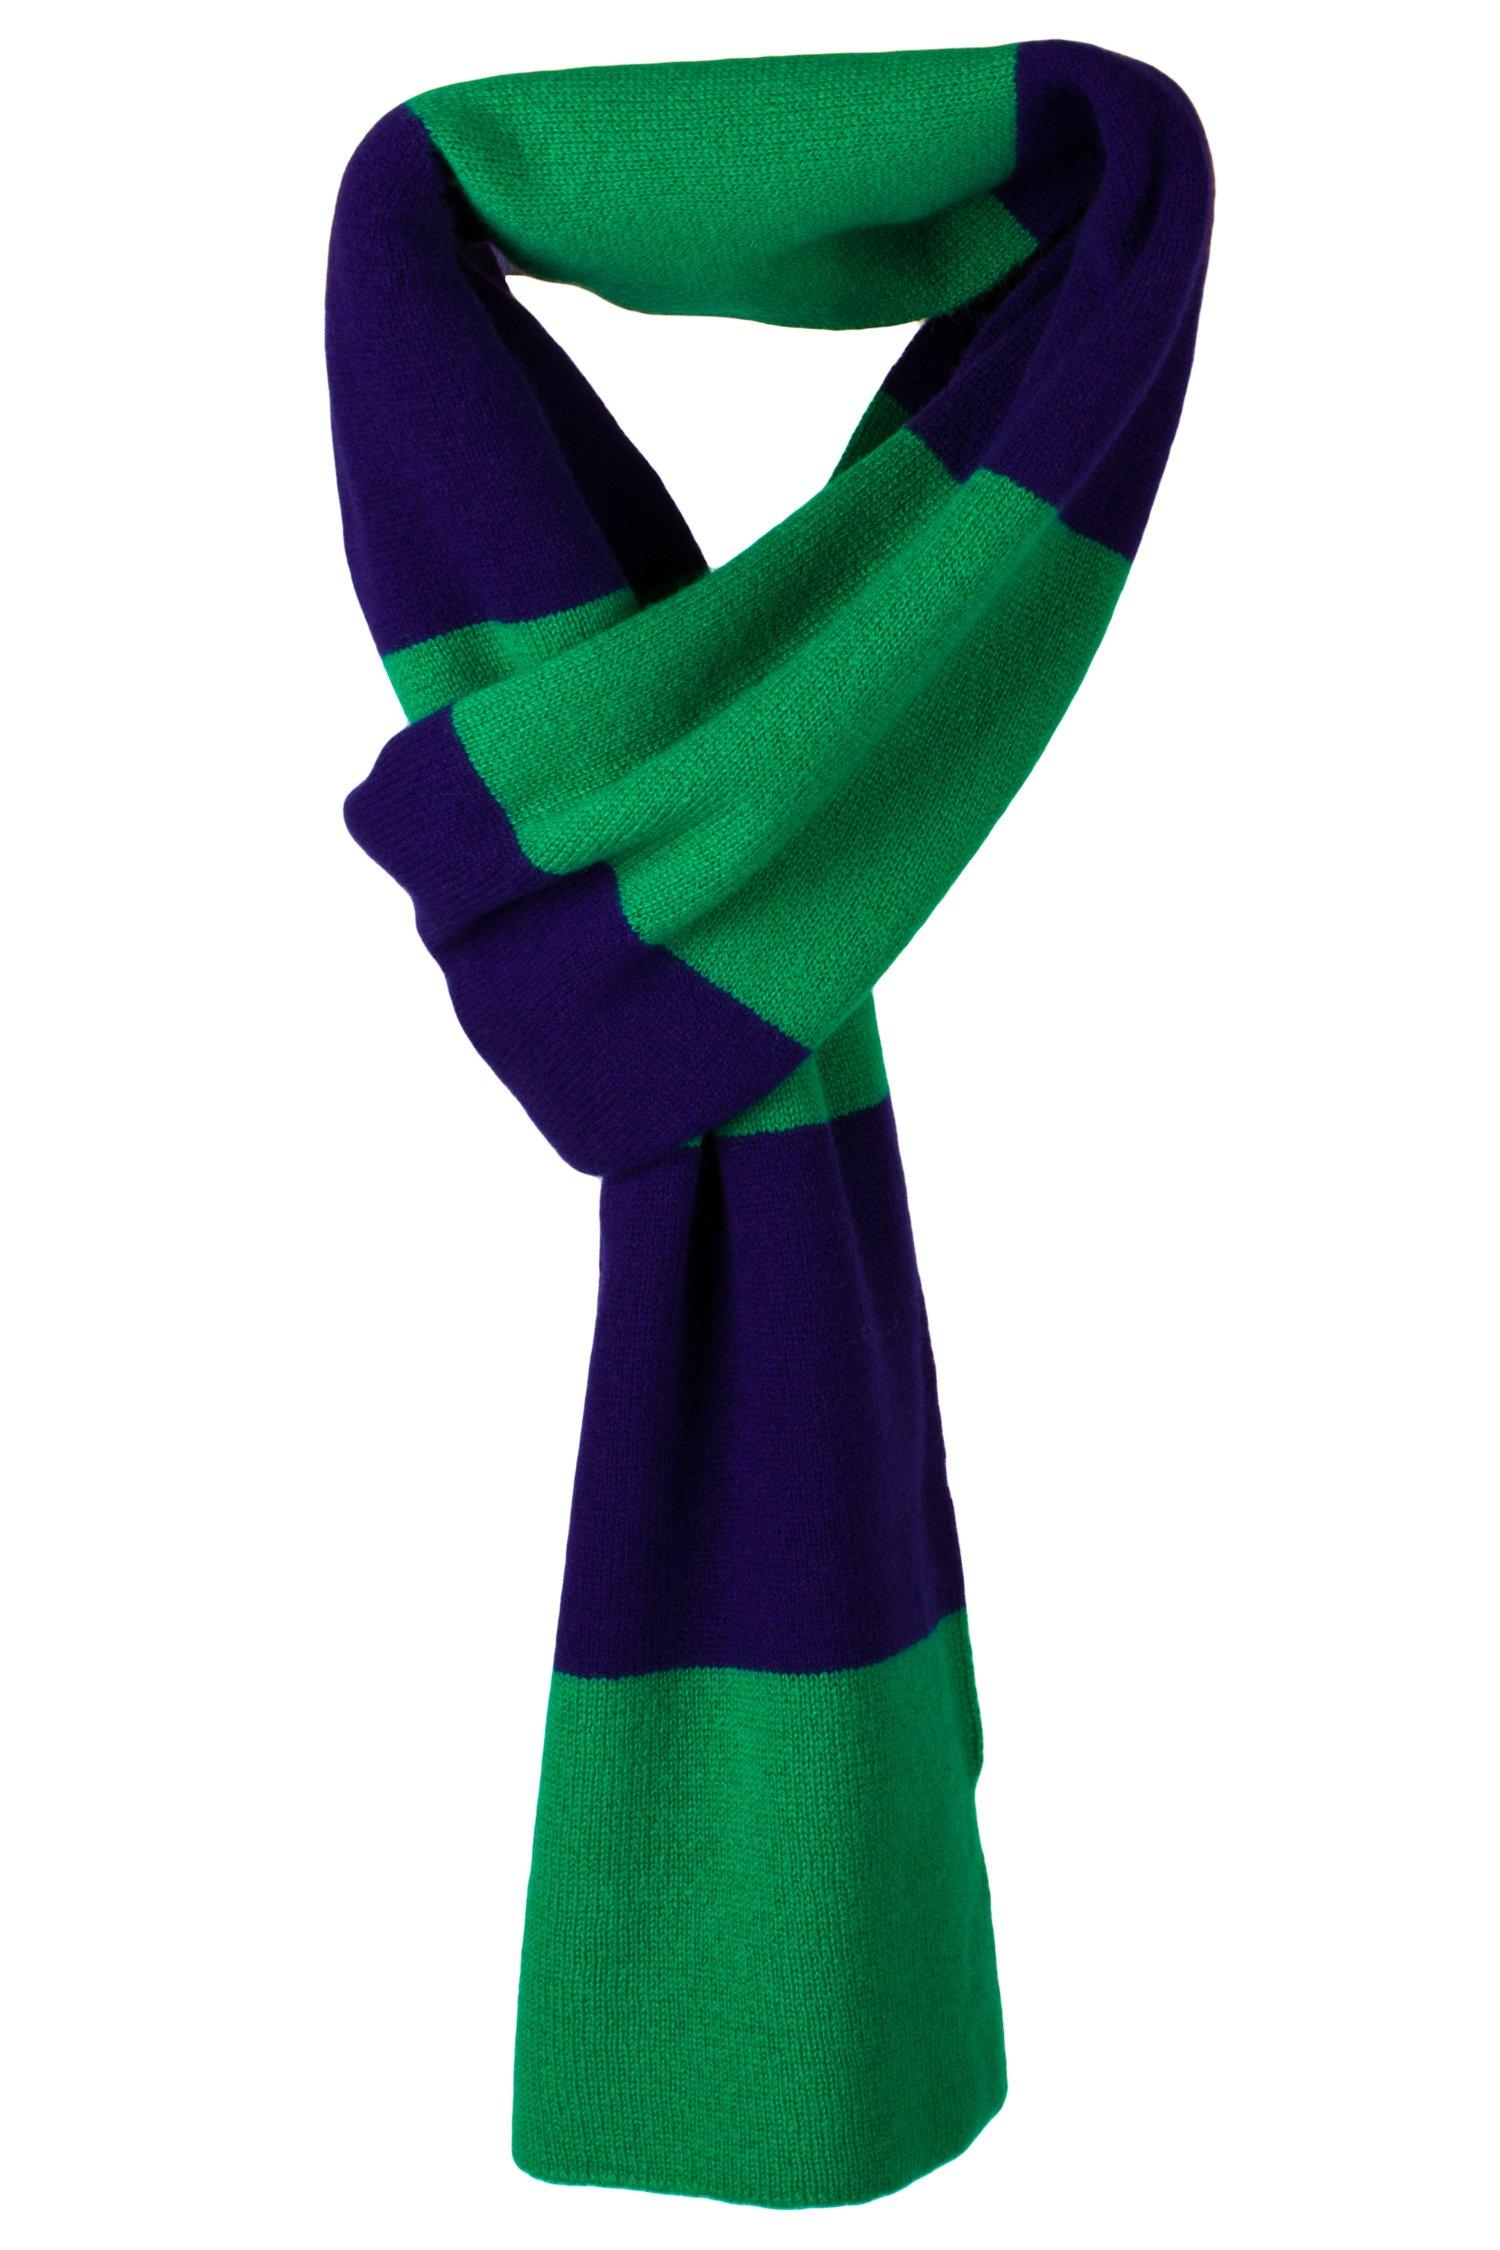 Mens Striped 100% Cashmere Scarf - Dark Blue / Green - hand made in Scotland by Love Cashmere